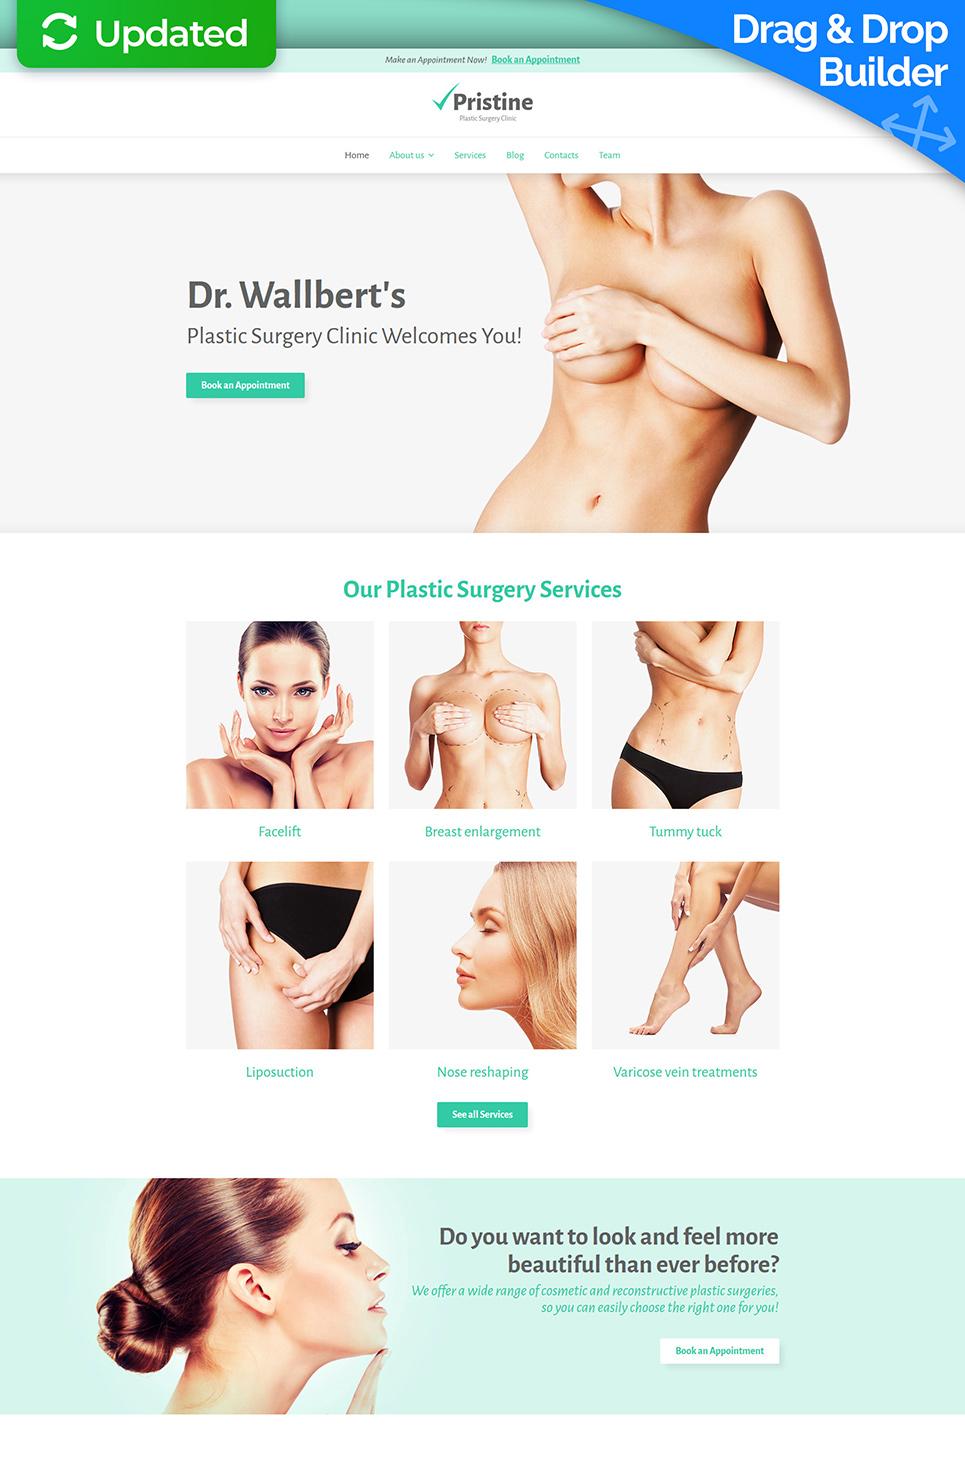 Pristine Responsive Website Template - image